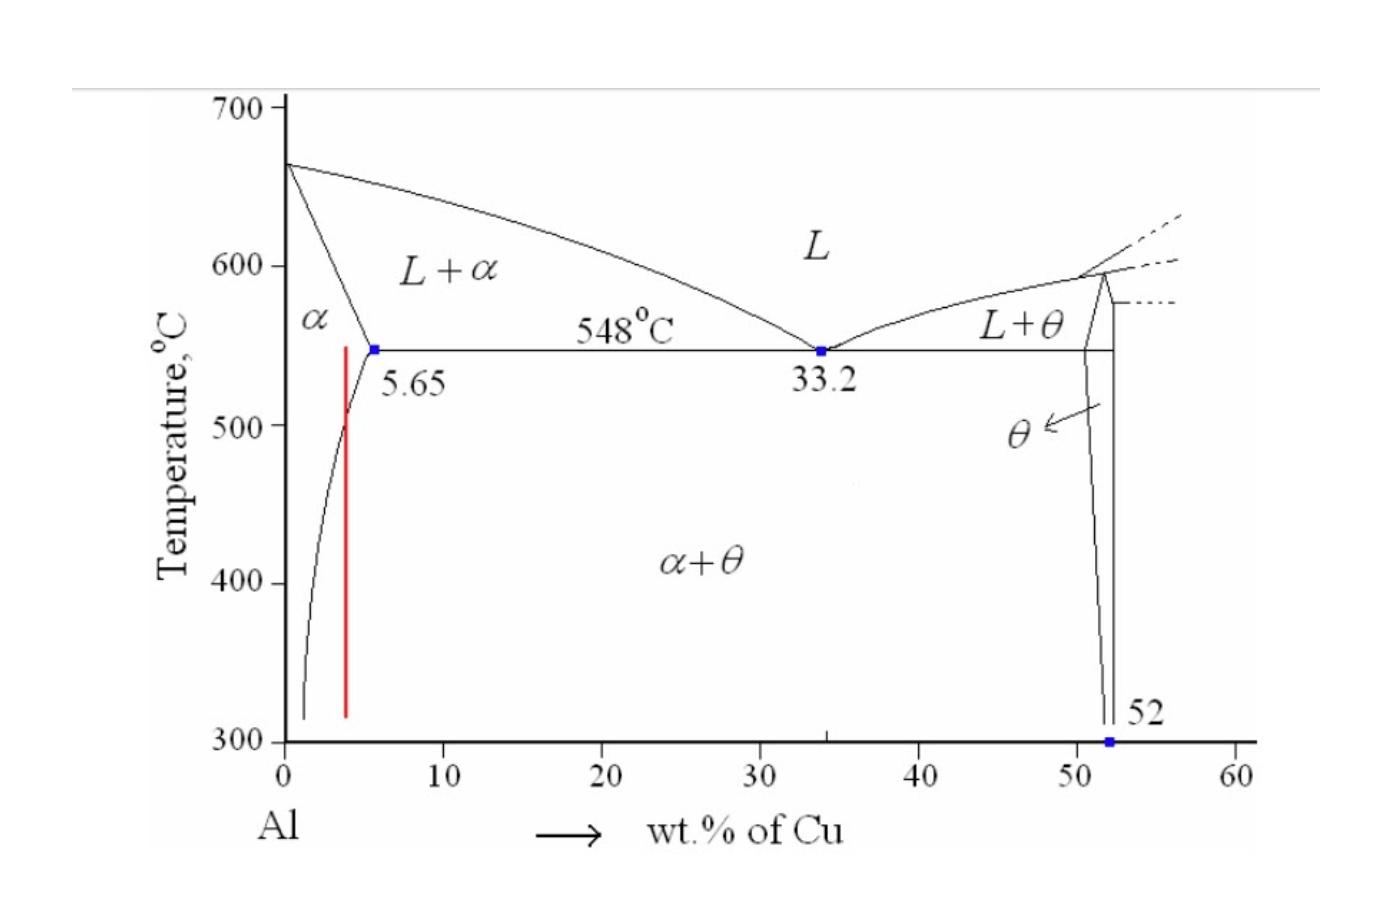 Figure 1. Aluminium rich end of Al-Cu phase diagram.